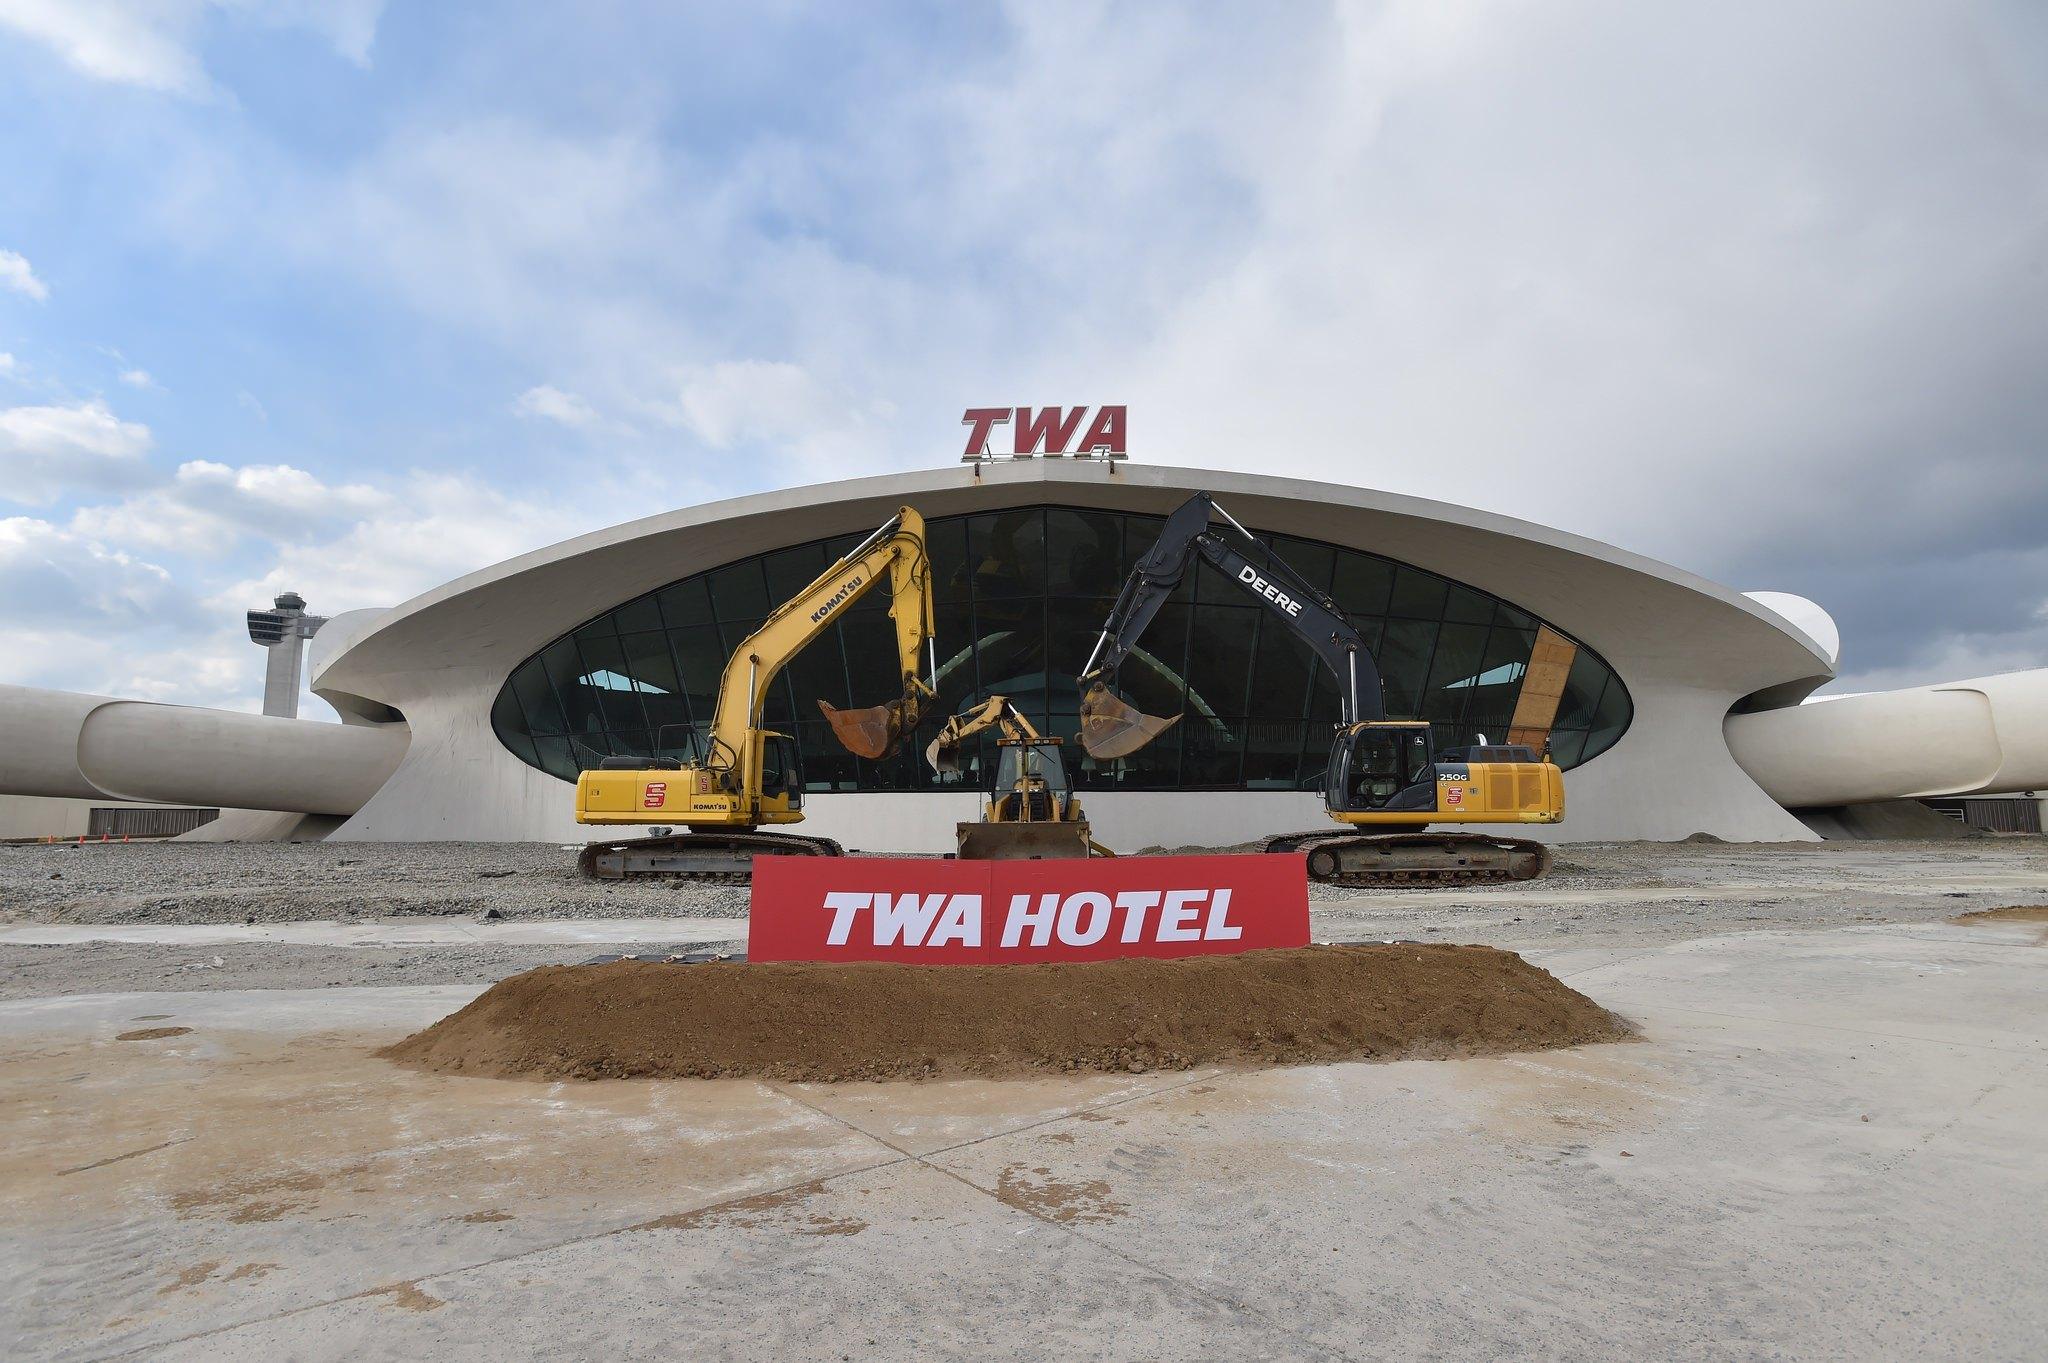 twa-hotel-cuomo-december-2016-1